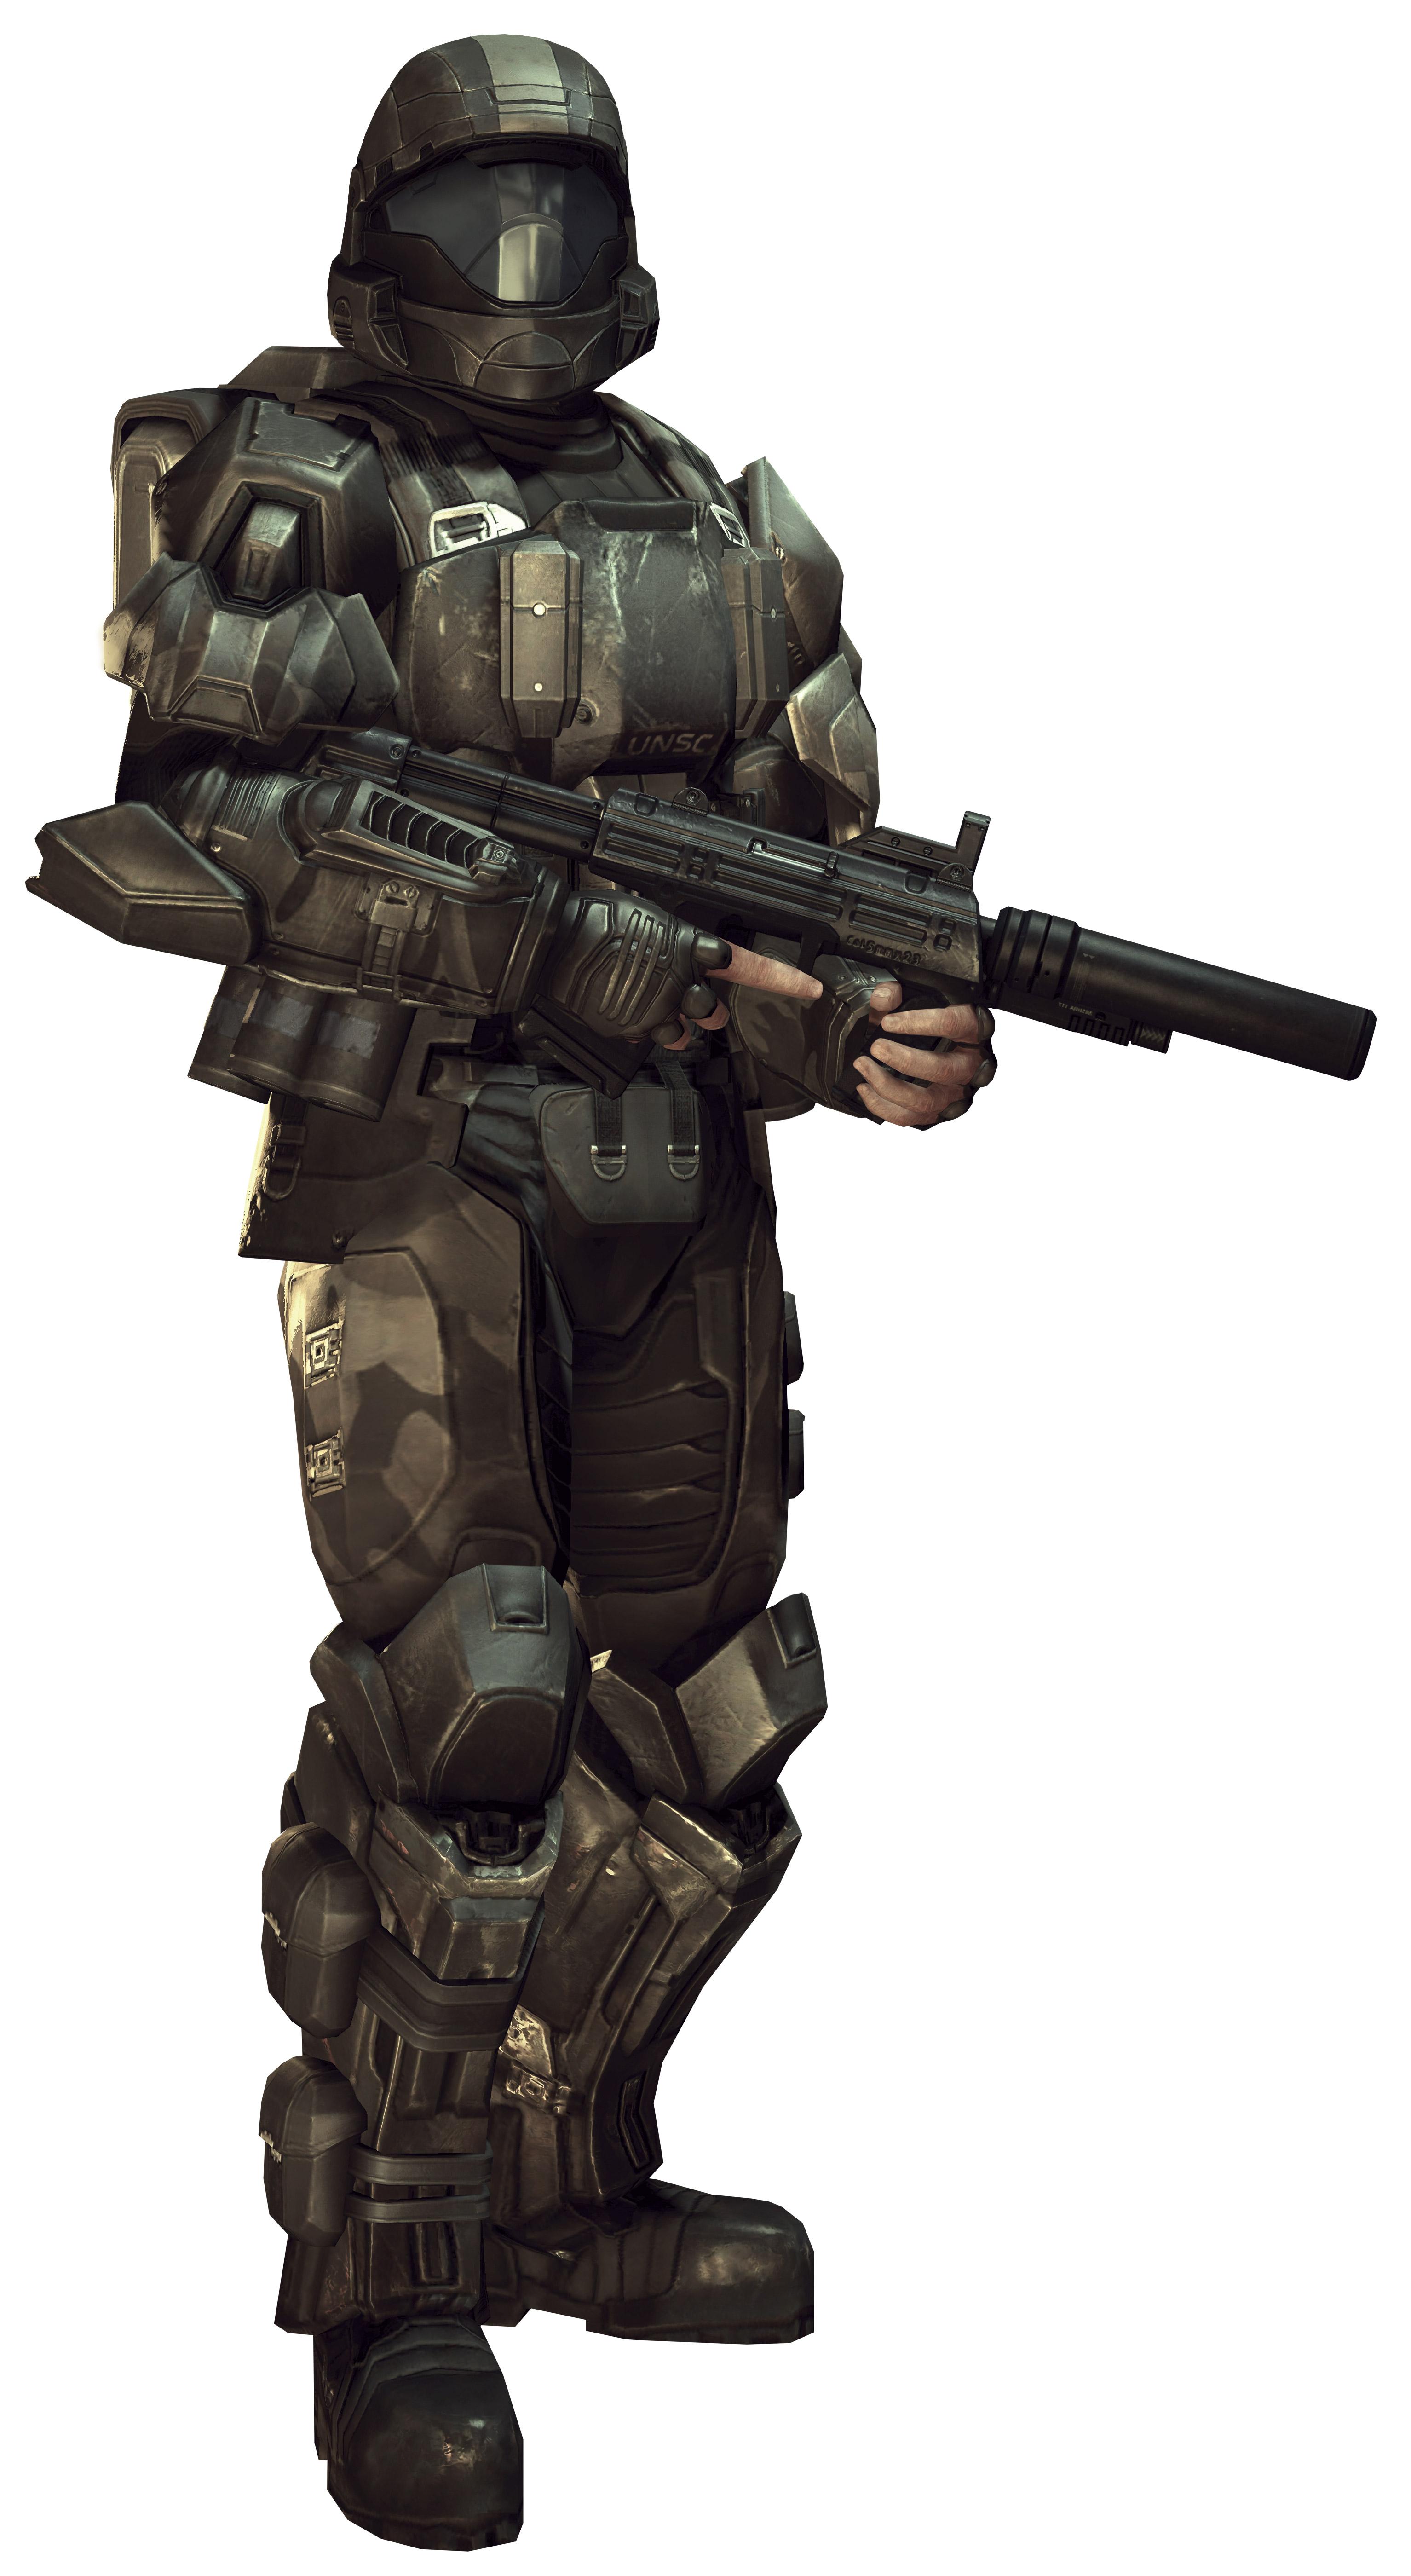 Amazoncom Halo 3 Legendary Edition Xbox 360 Xbox 360